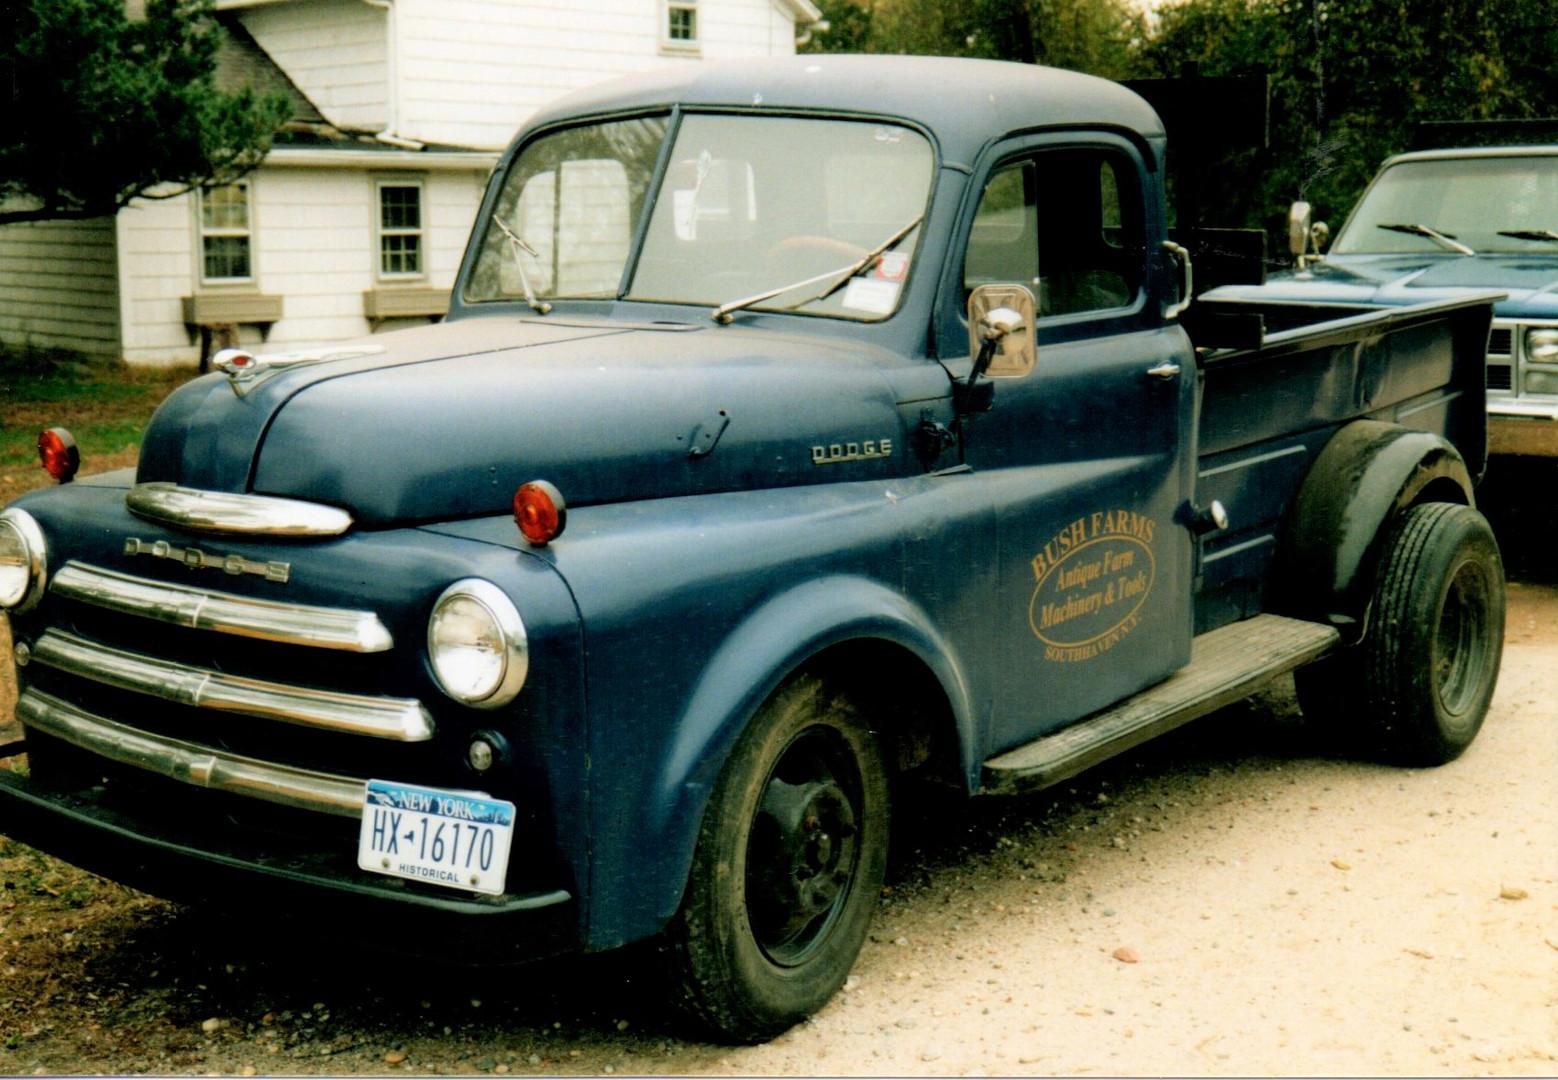 Final Stop - Ron Bush's Farming Museum in Brookhaven